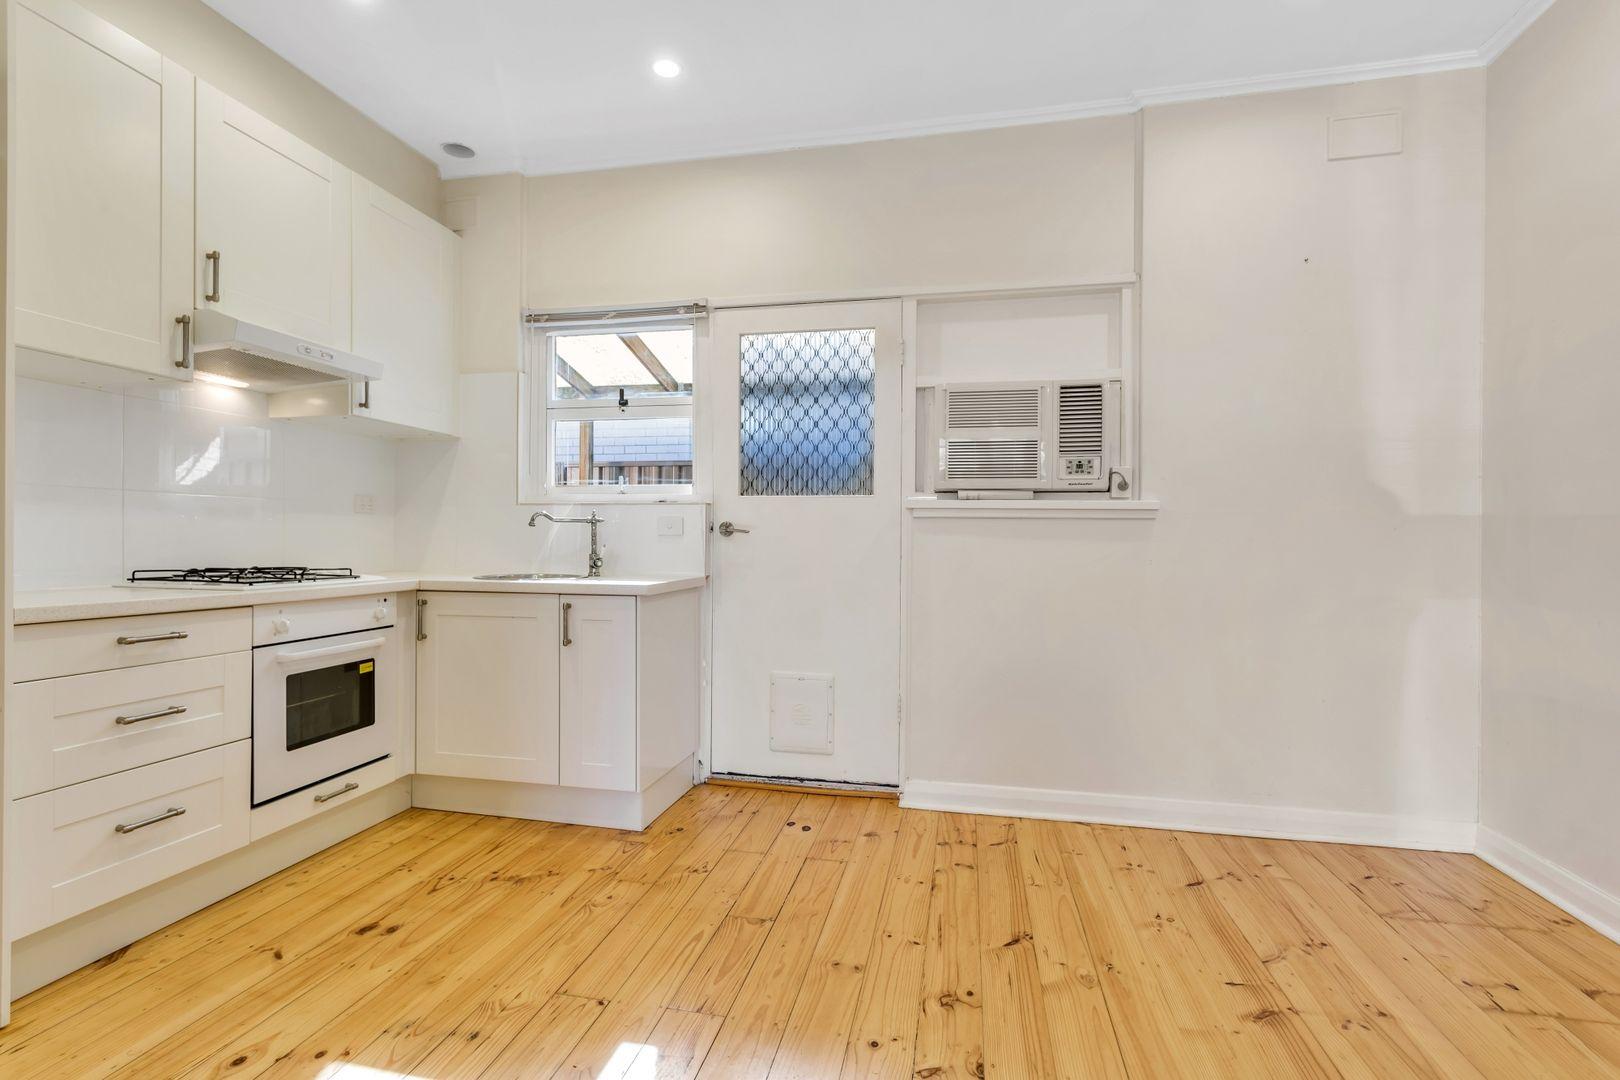 1 bedrooms House in 3/58 Dunbar Terrace GLENELG SA, 5045